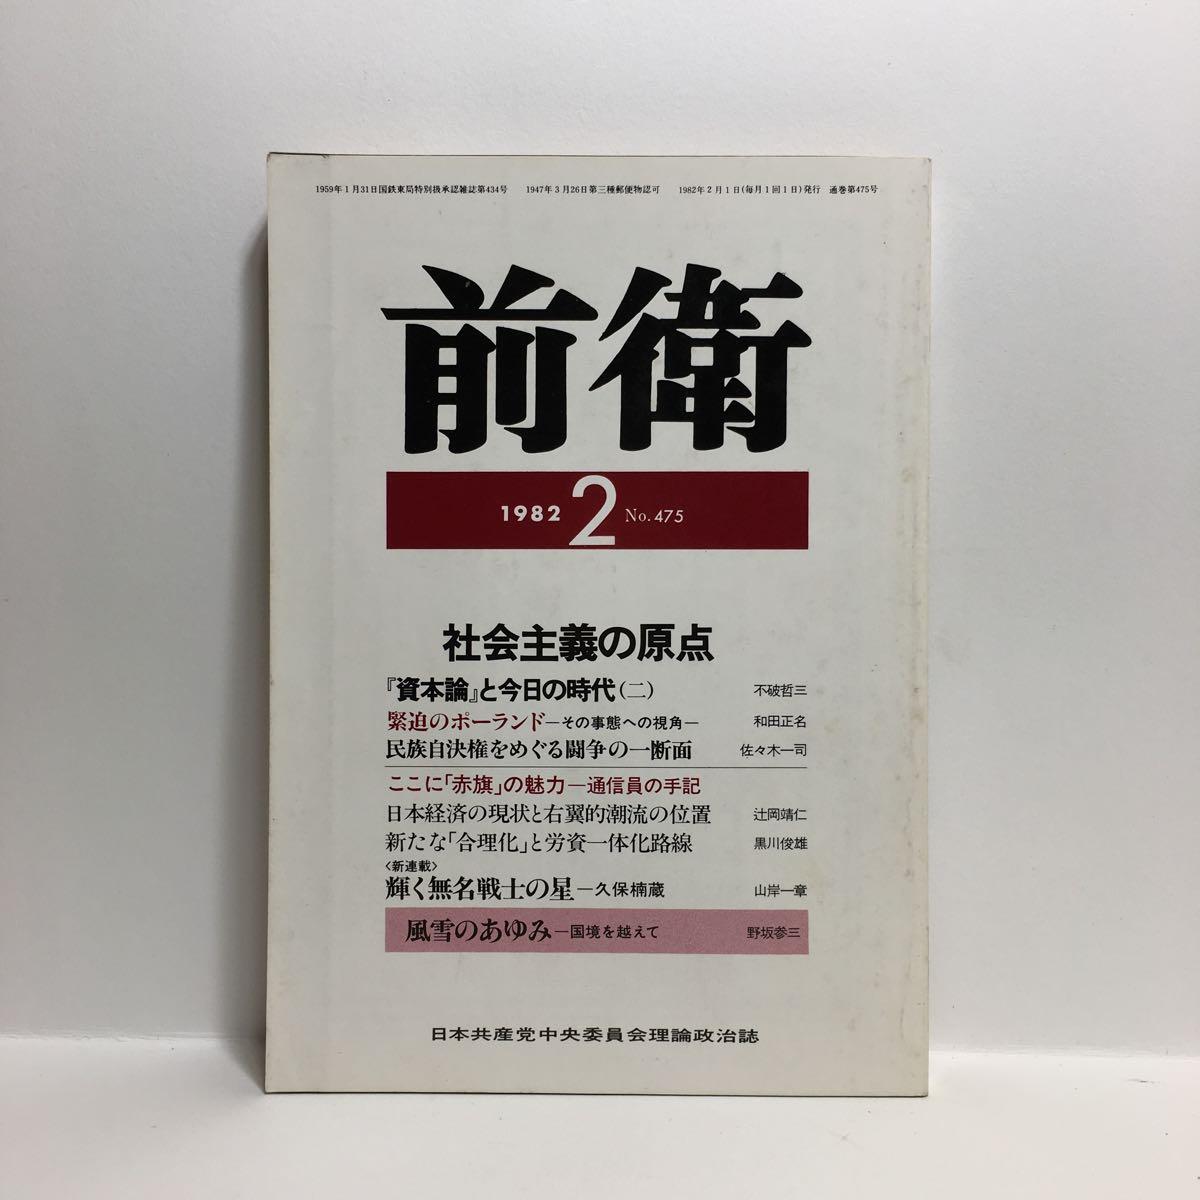 b1/前衛 No.475 1982.2 特集 社会主義の原点 日本共産党中央委員会理論政治誌 ゆうメール送料180円